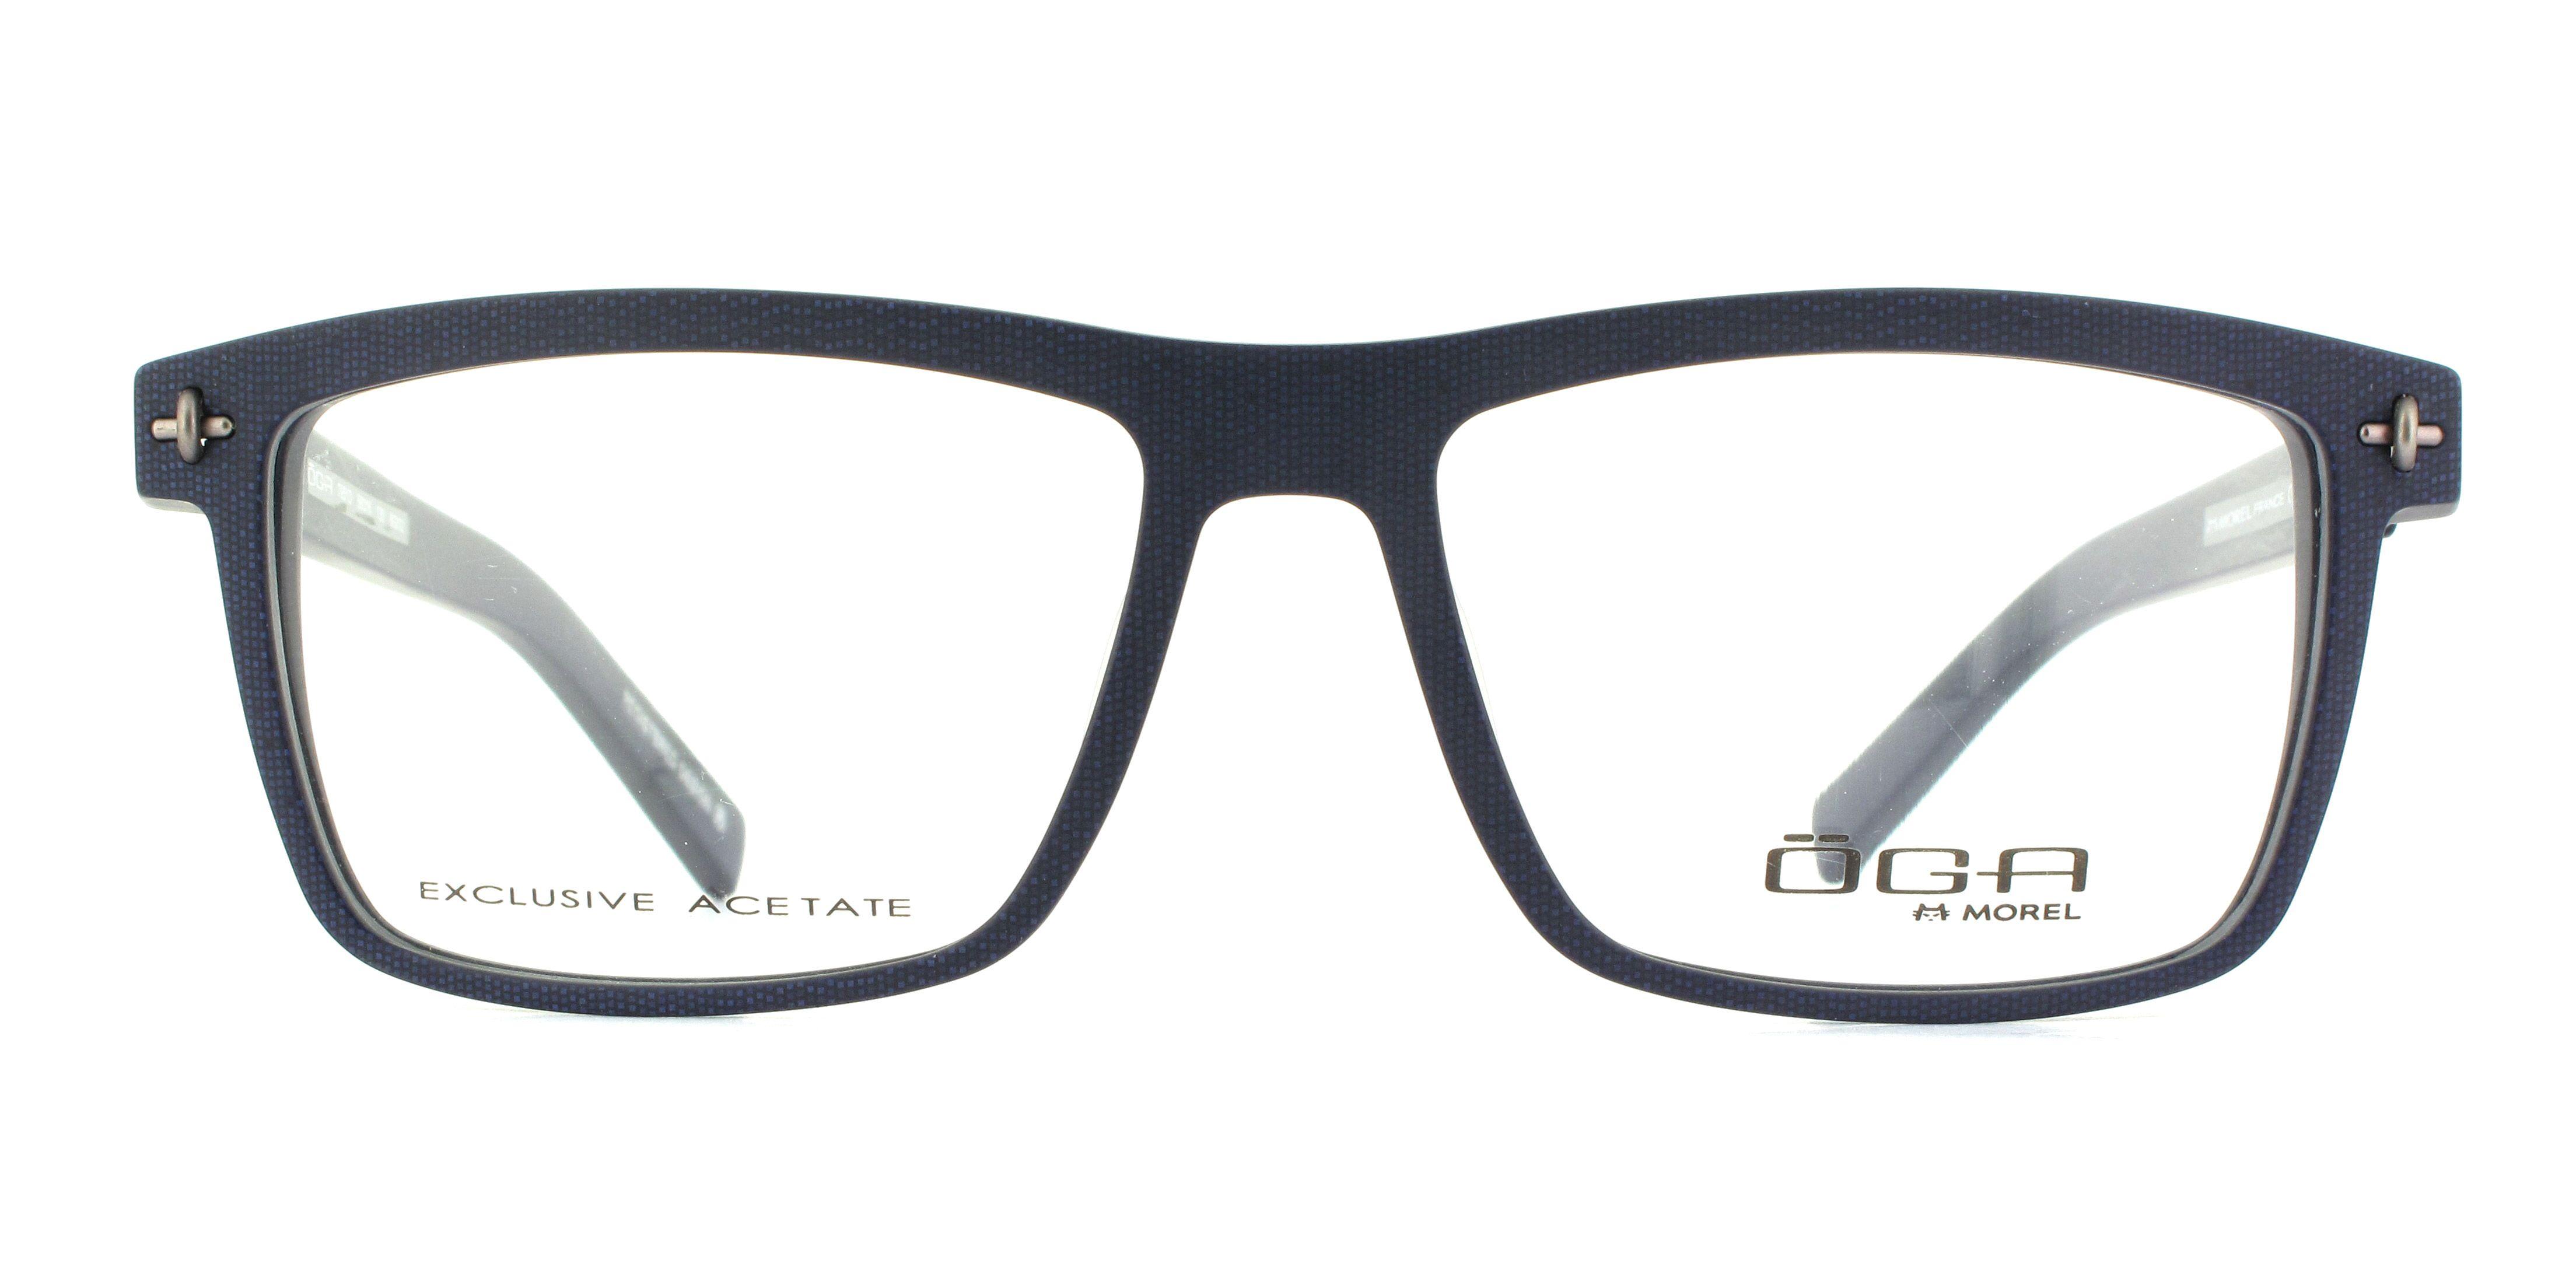 resized lindberg glasses brands levit eyewear jaguar all rgb c barnard frames